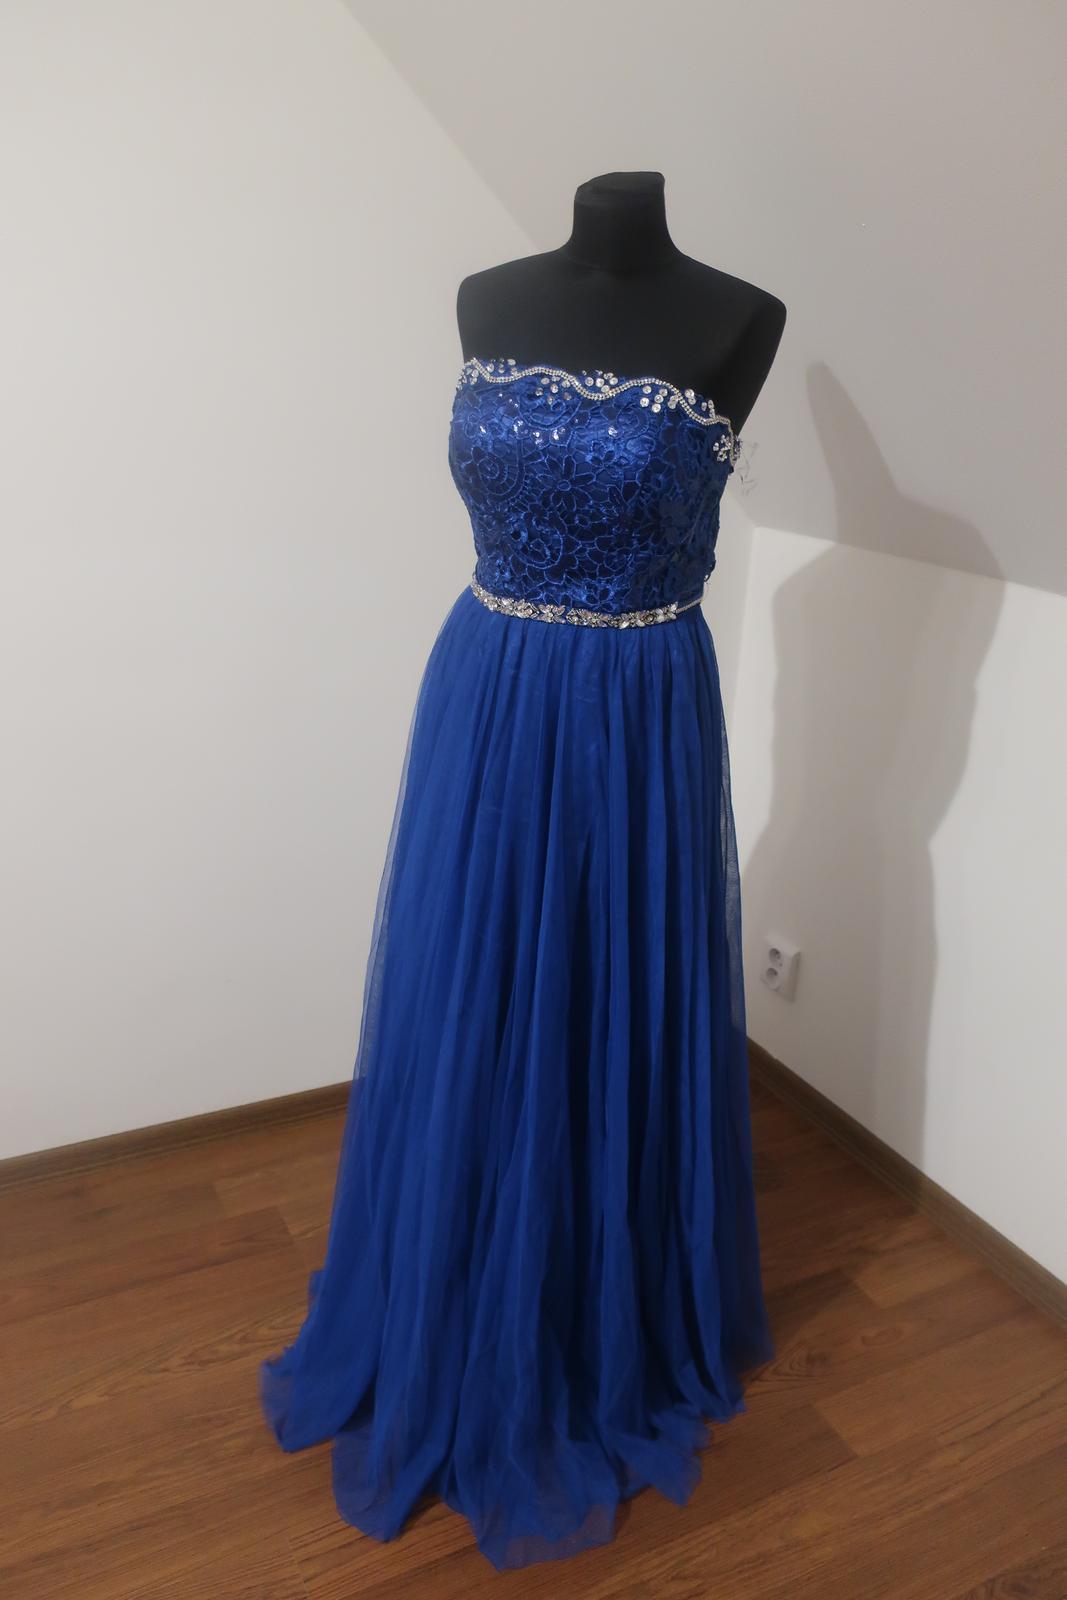 Dlhé modré šaty - Obrázok č. 1